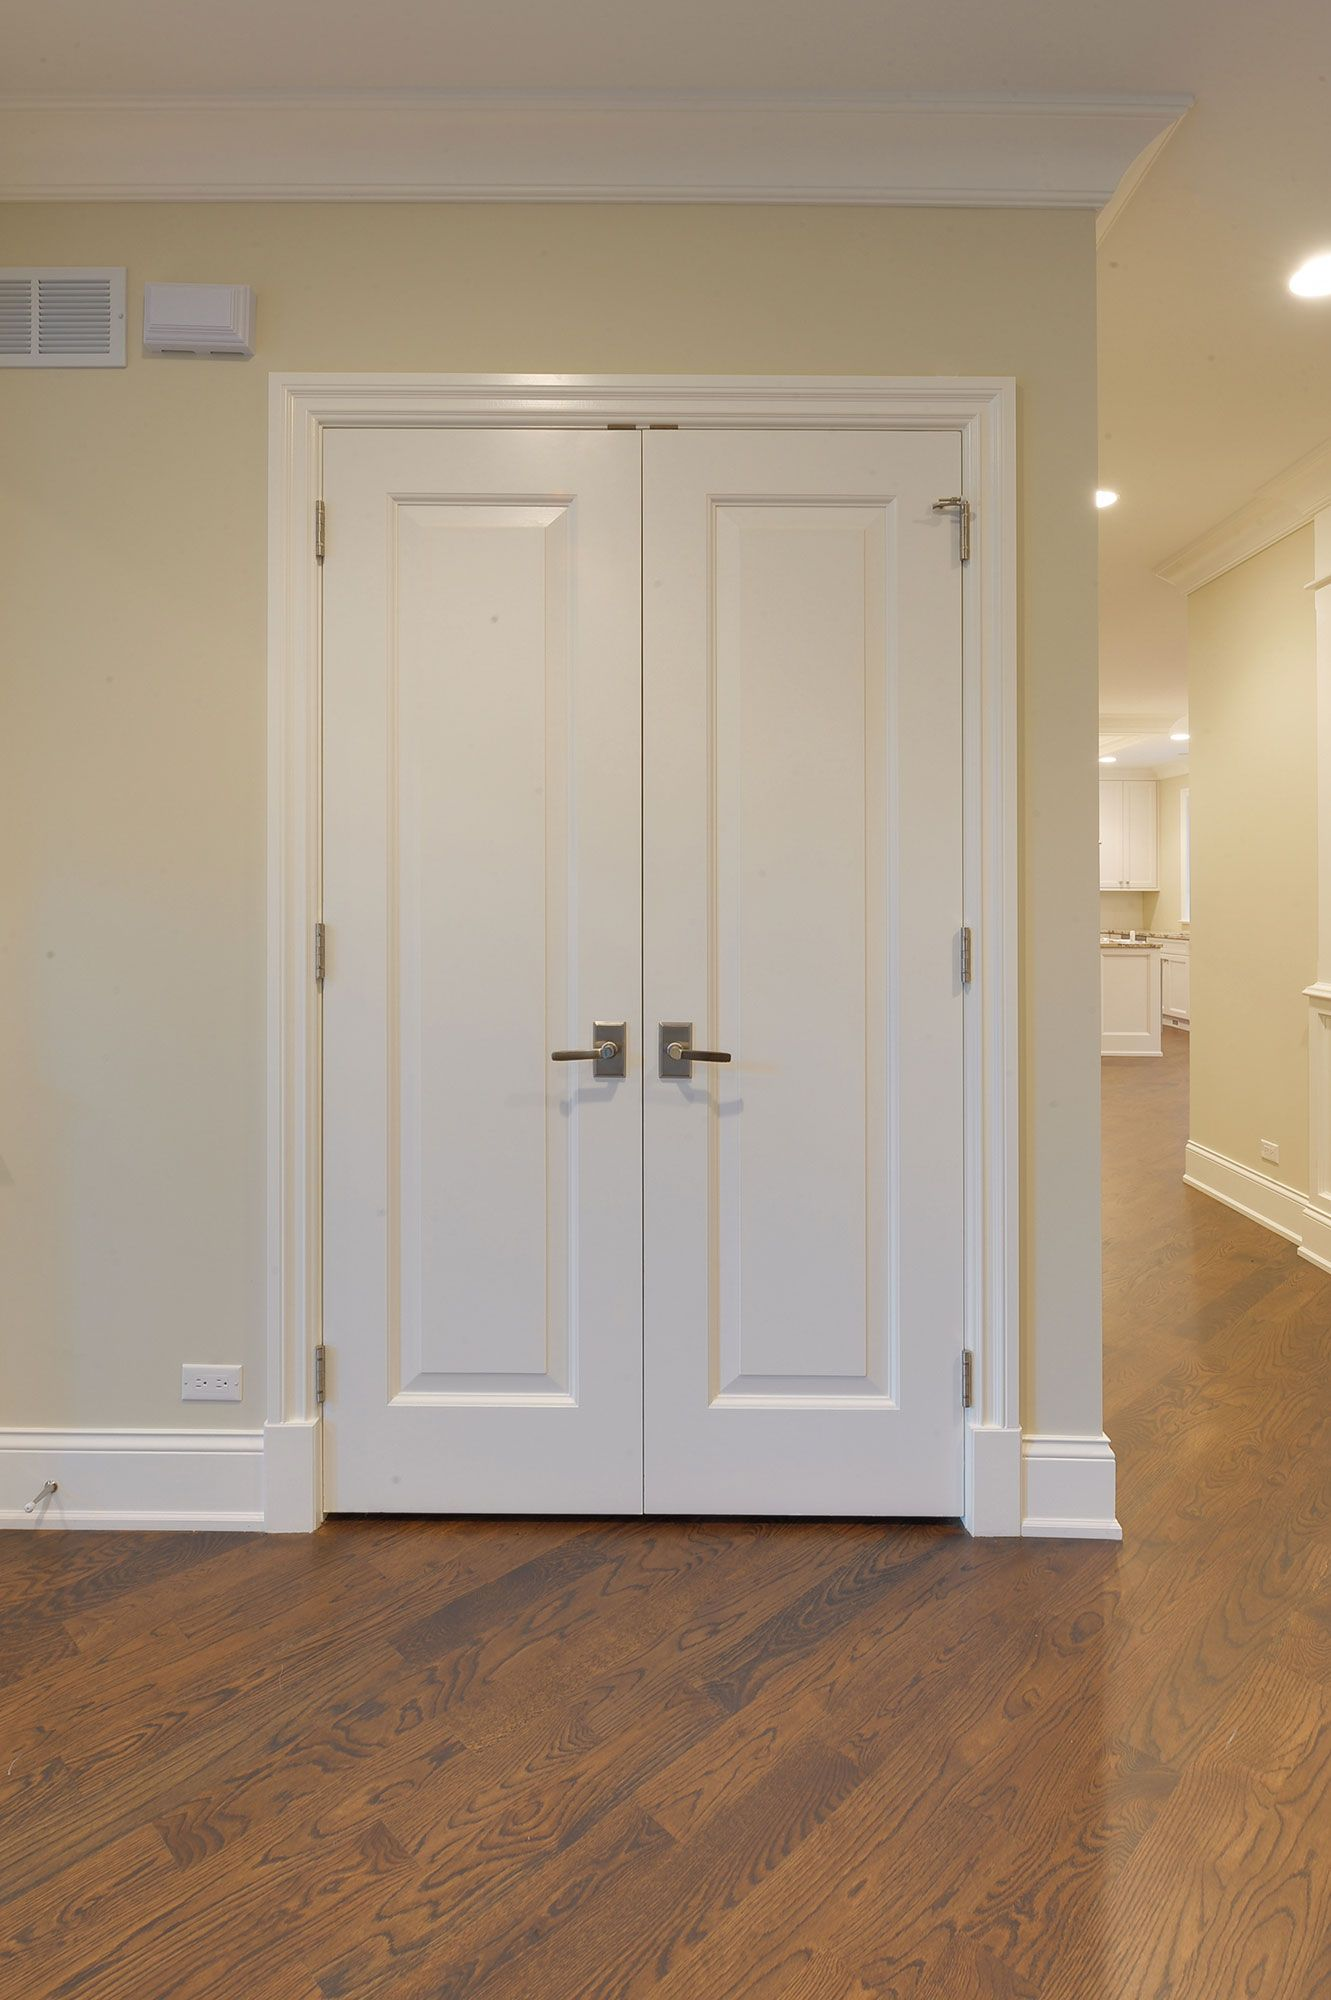 Image Result For Foyer Closet Ideas Sliding Closet Doors Small